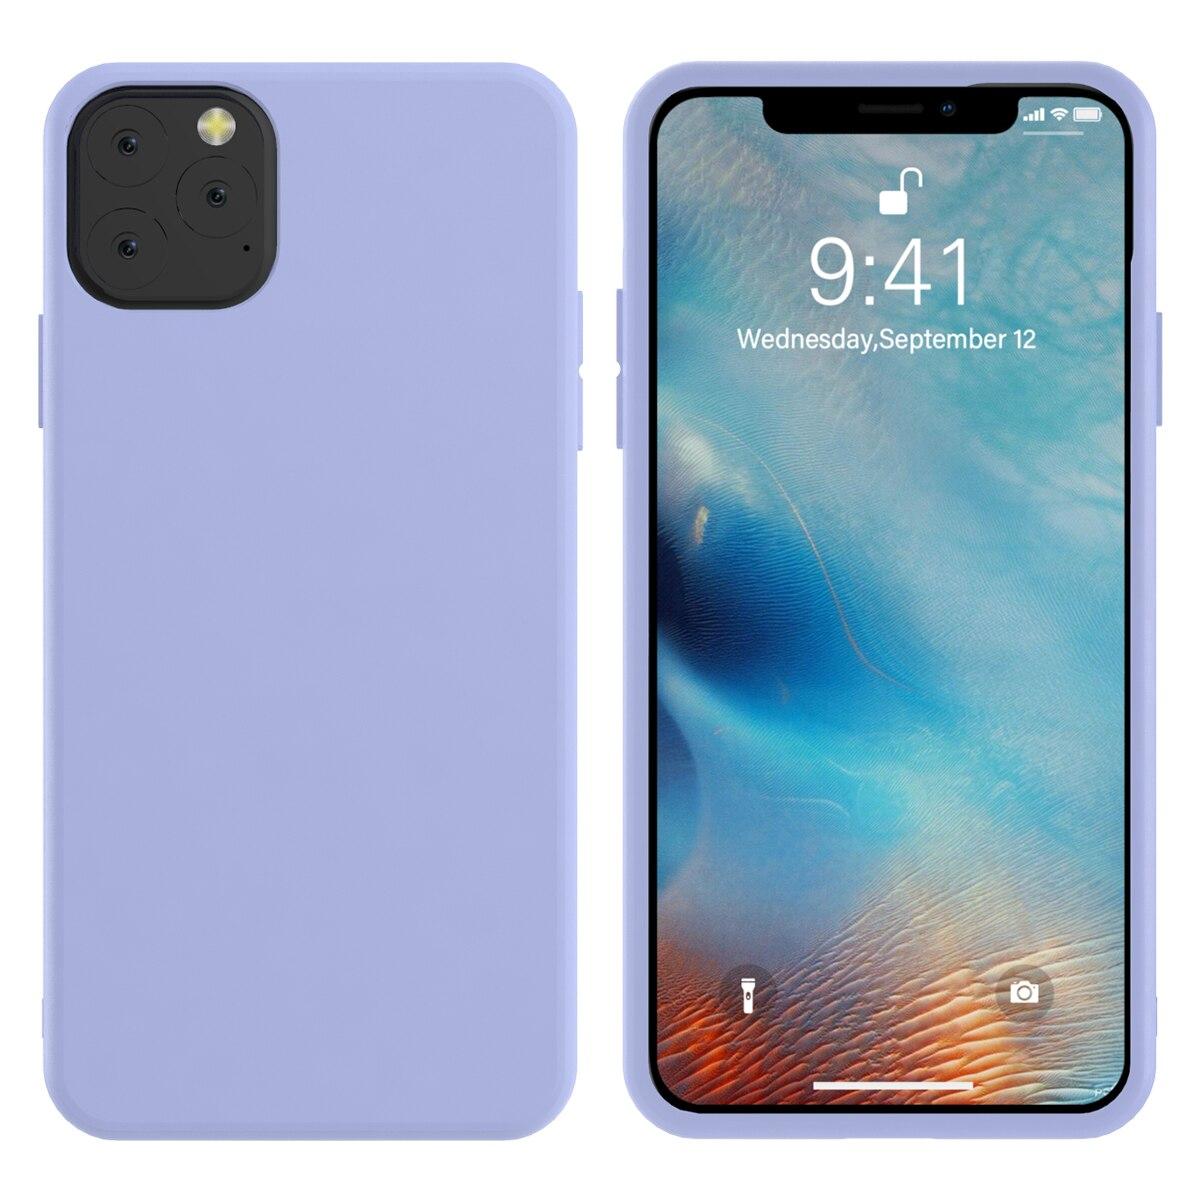 Torubia Silicone Case for iPhone 11/11 Pro/11 Pro Max 35